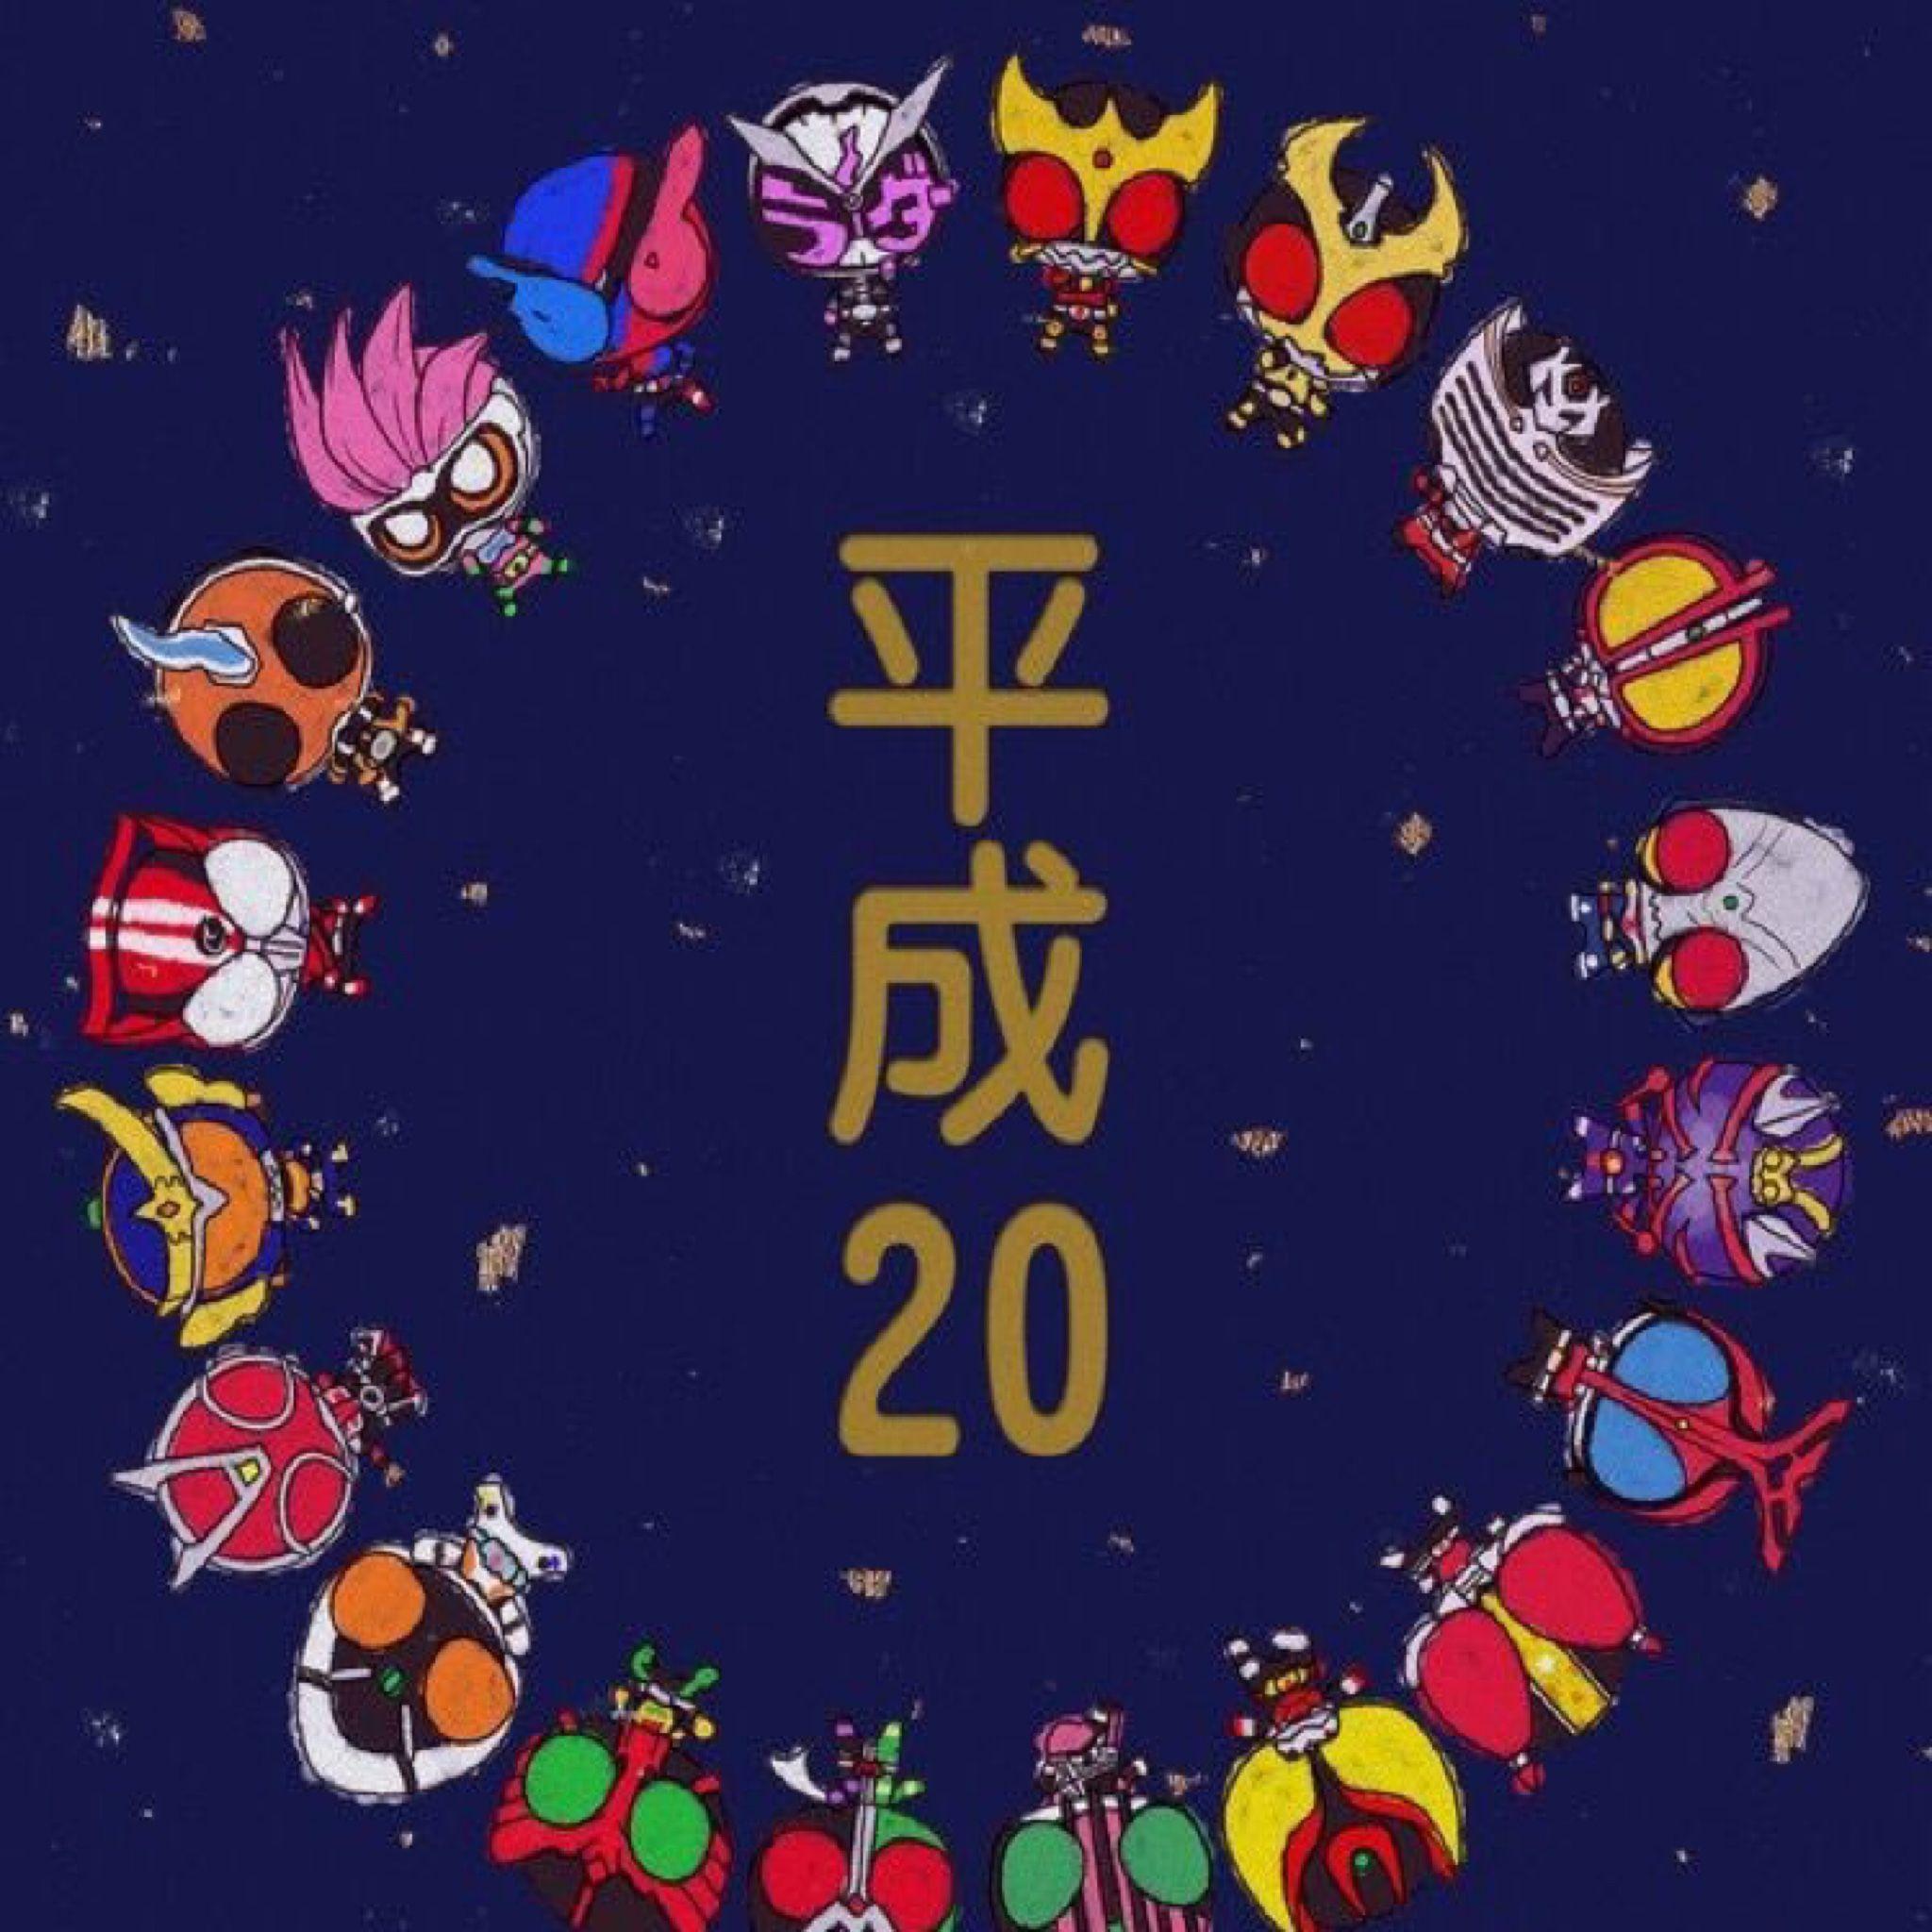 Kamen Rider songs a playlist by joshuayi | Stream New Music on Audiomack